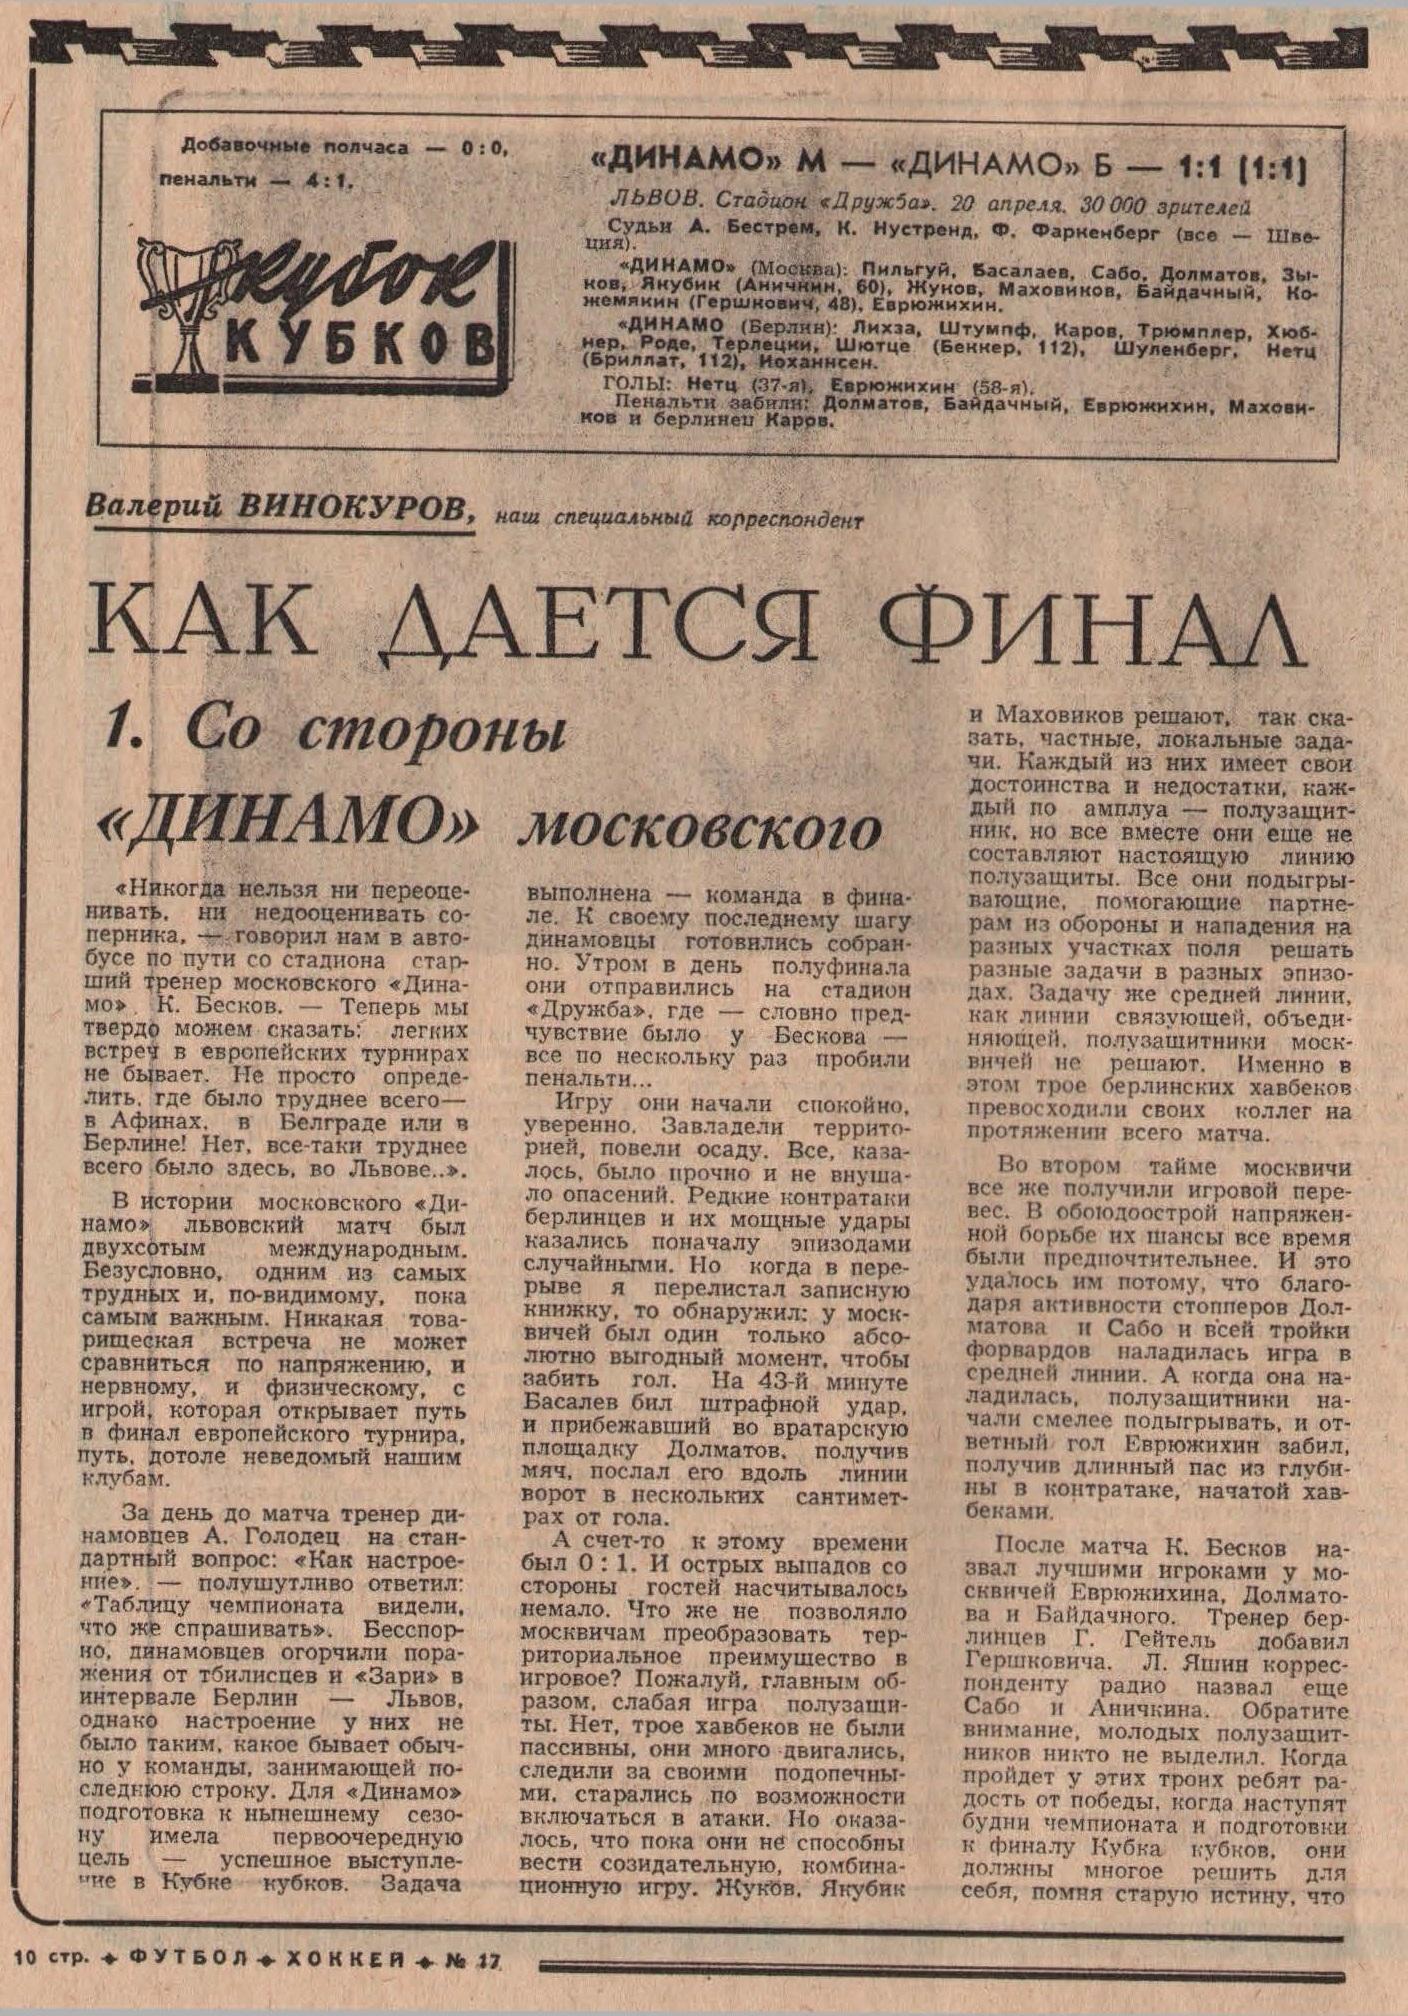 Динамо (СССР) - Динамо Берлин (ГДР) 1:1 пен. 4:1